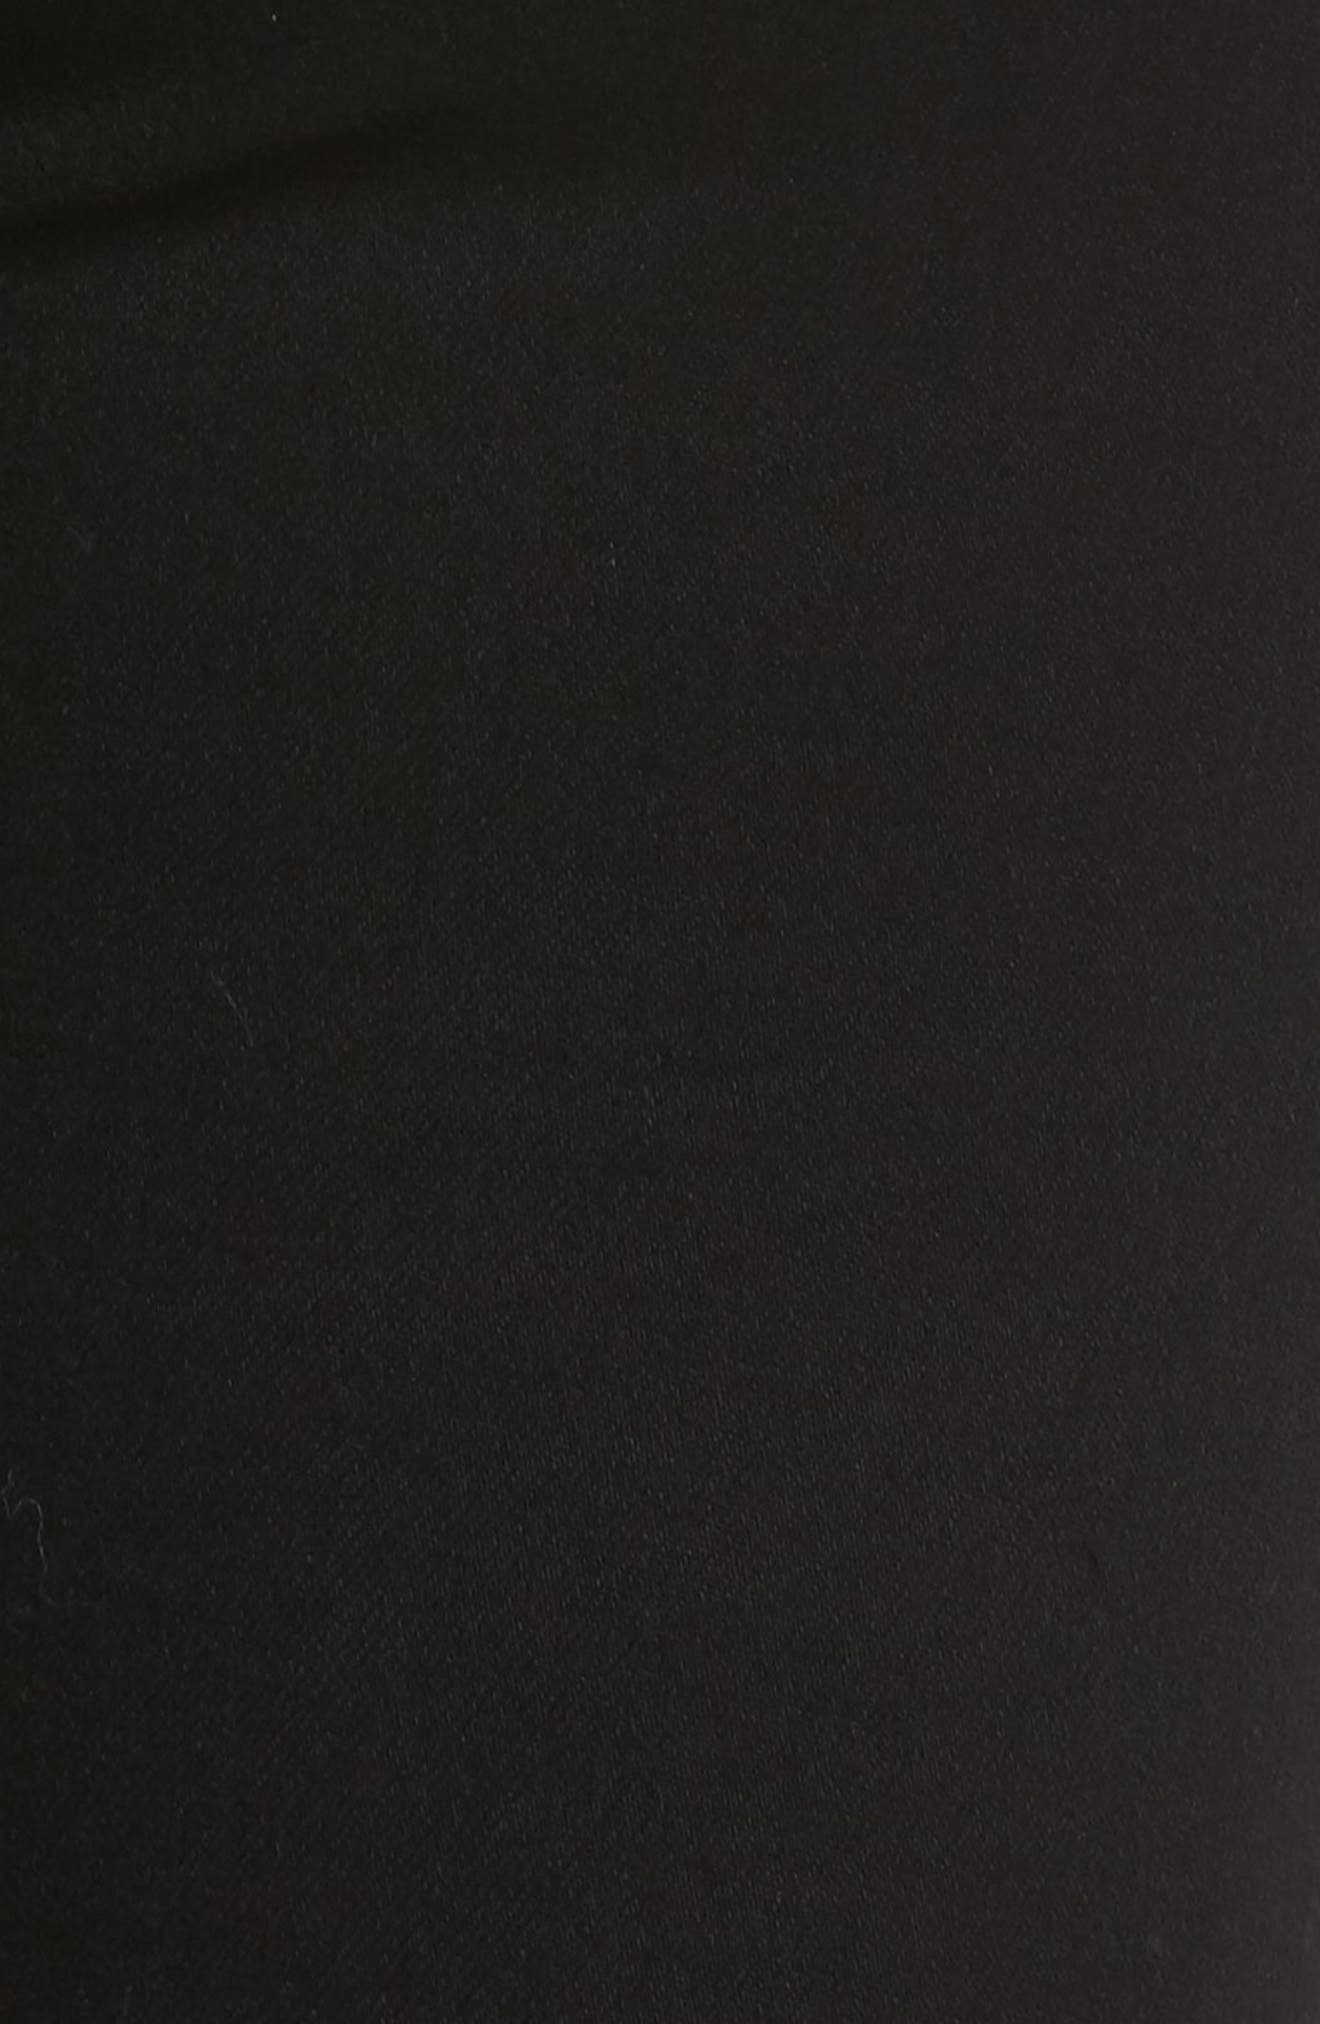 Sarah Skinny Jeans,                             Alternate thumbnail 6, color,                             001